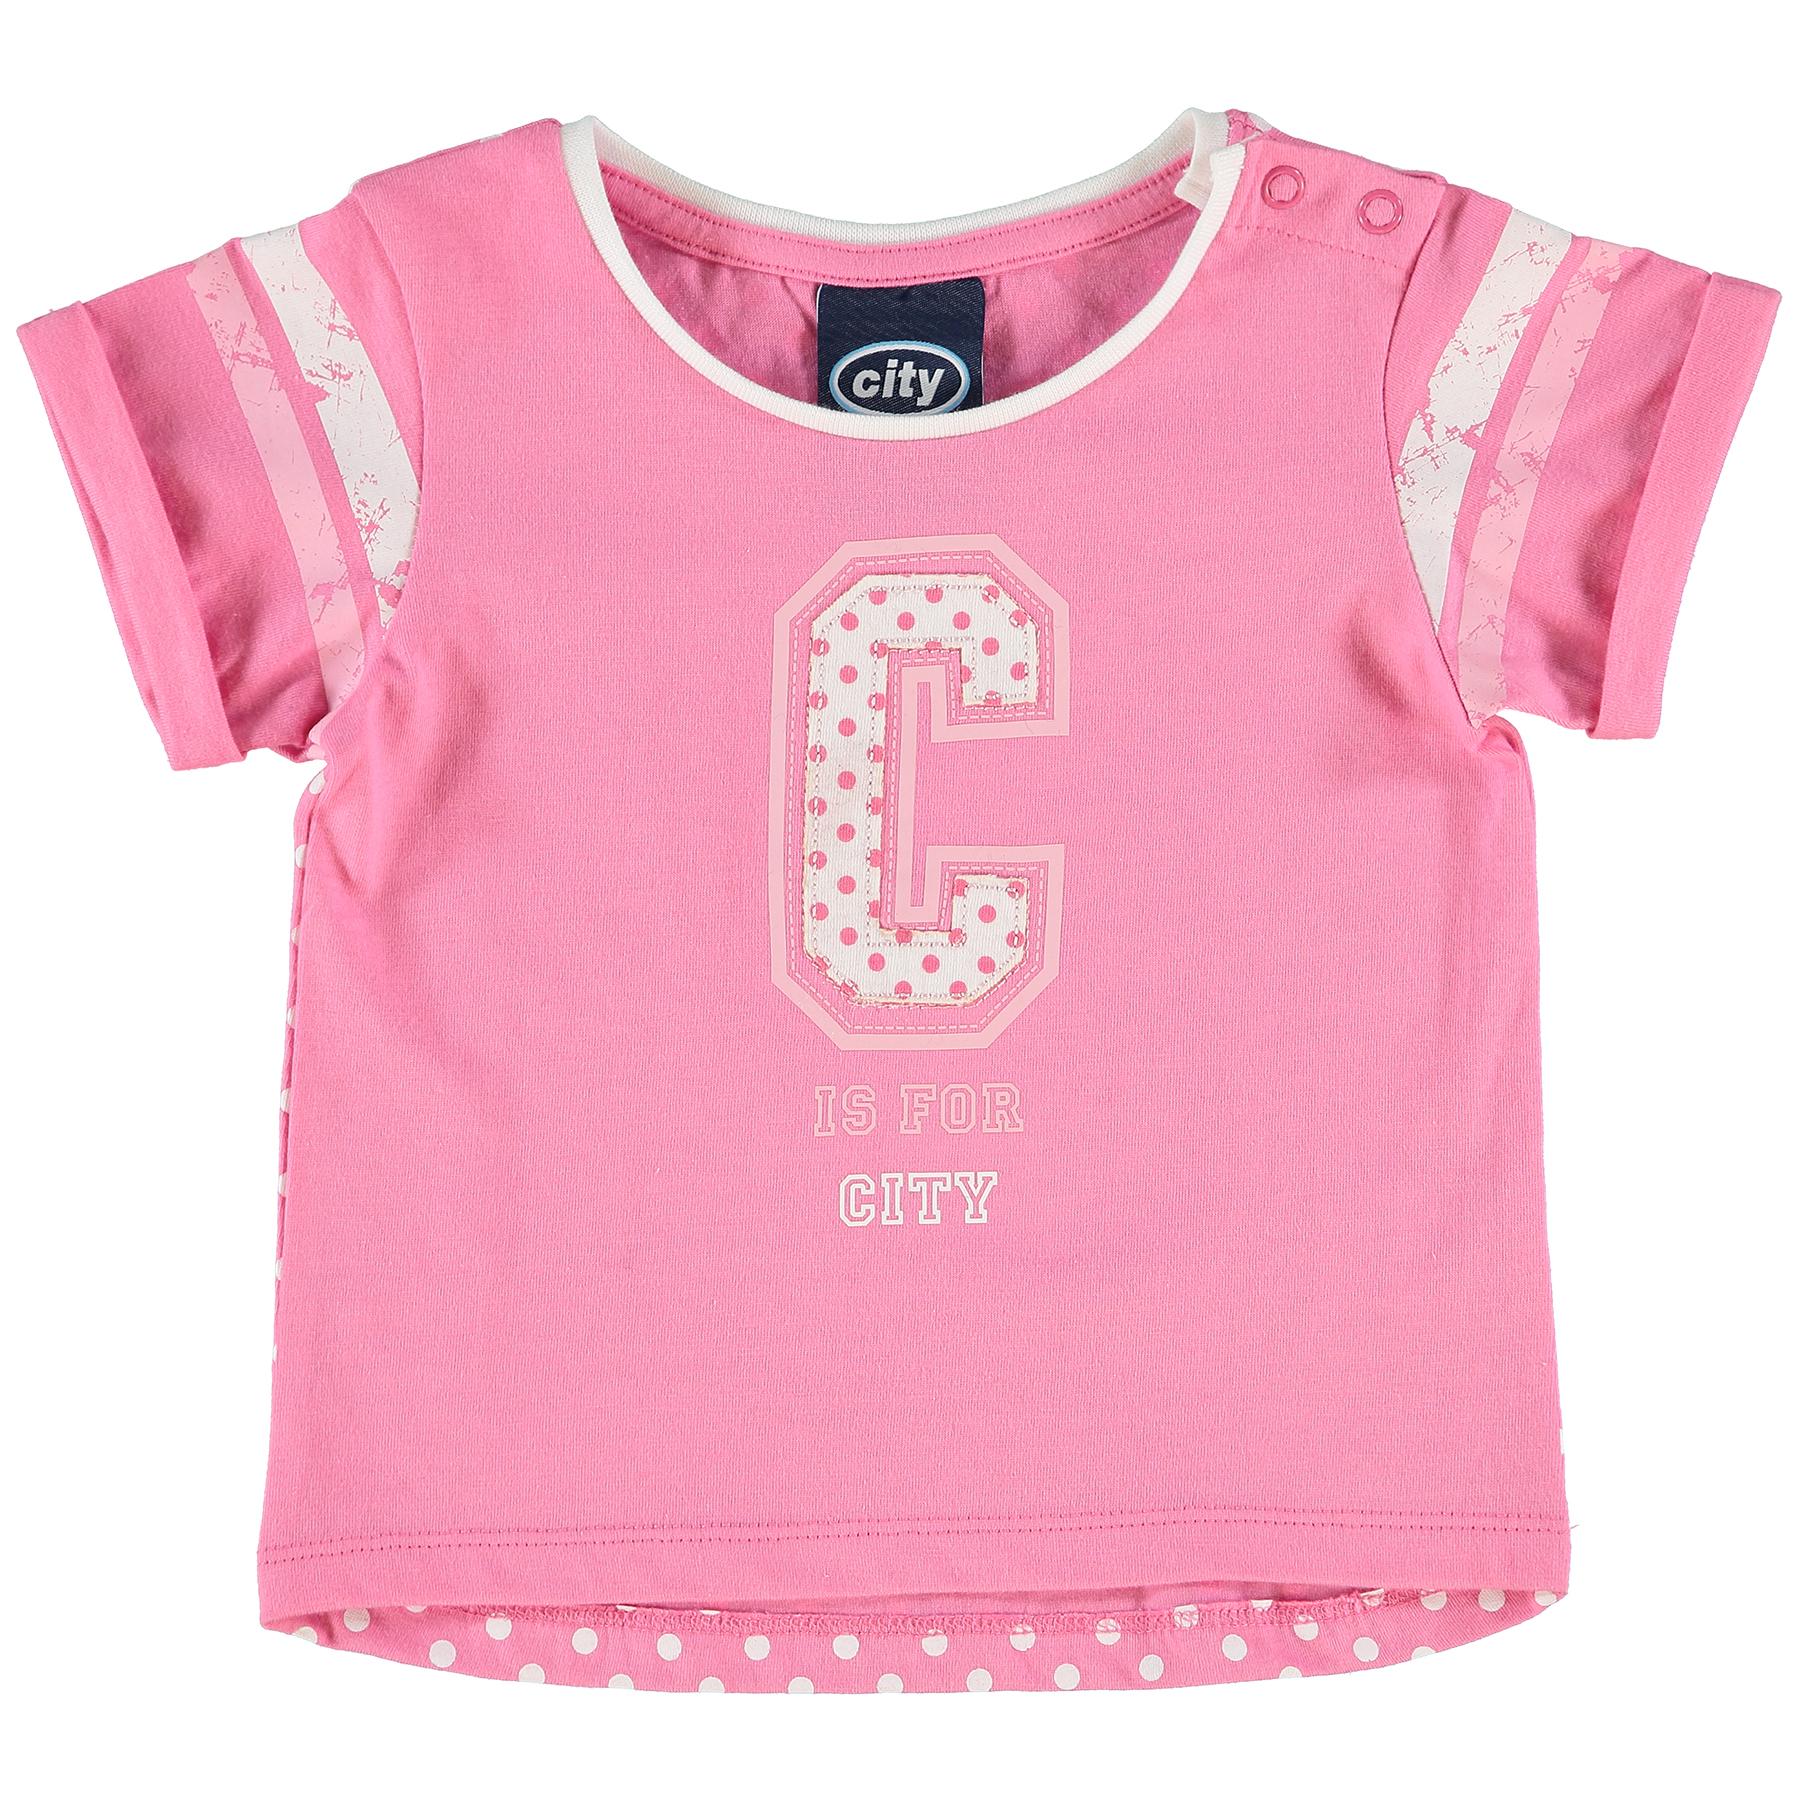 Manchester City Varsity T-Shirt - Hot Pink - Baby